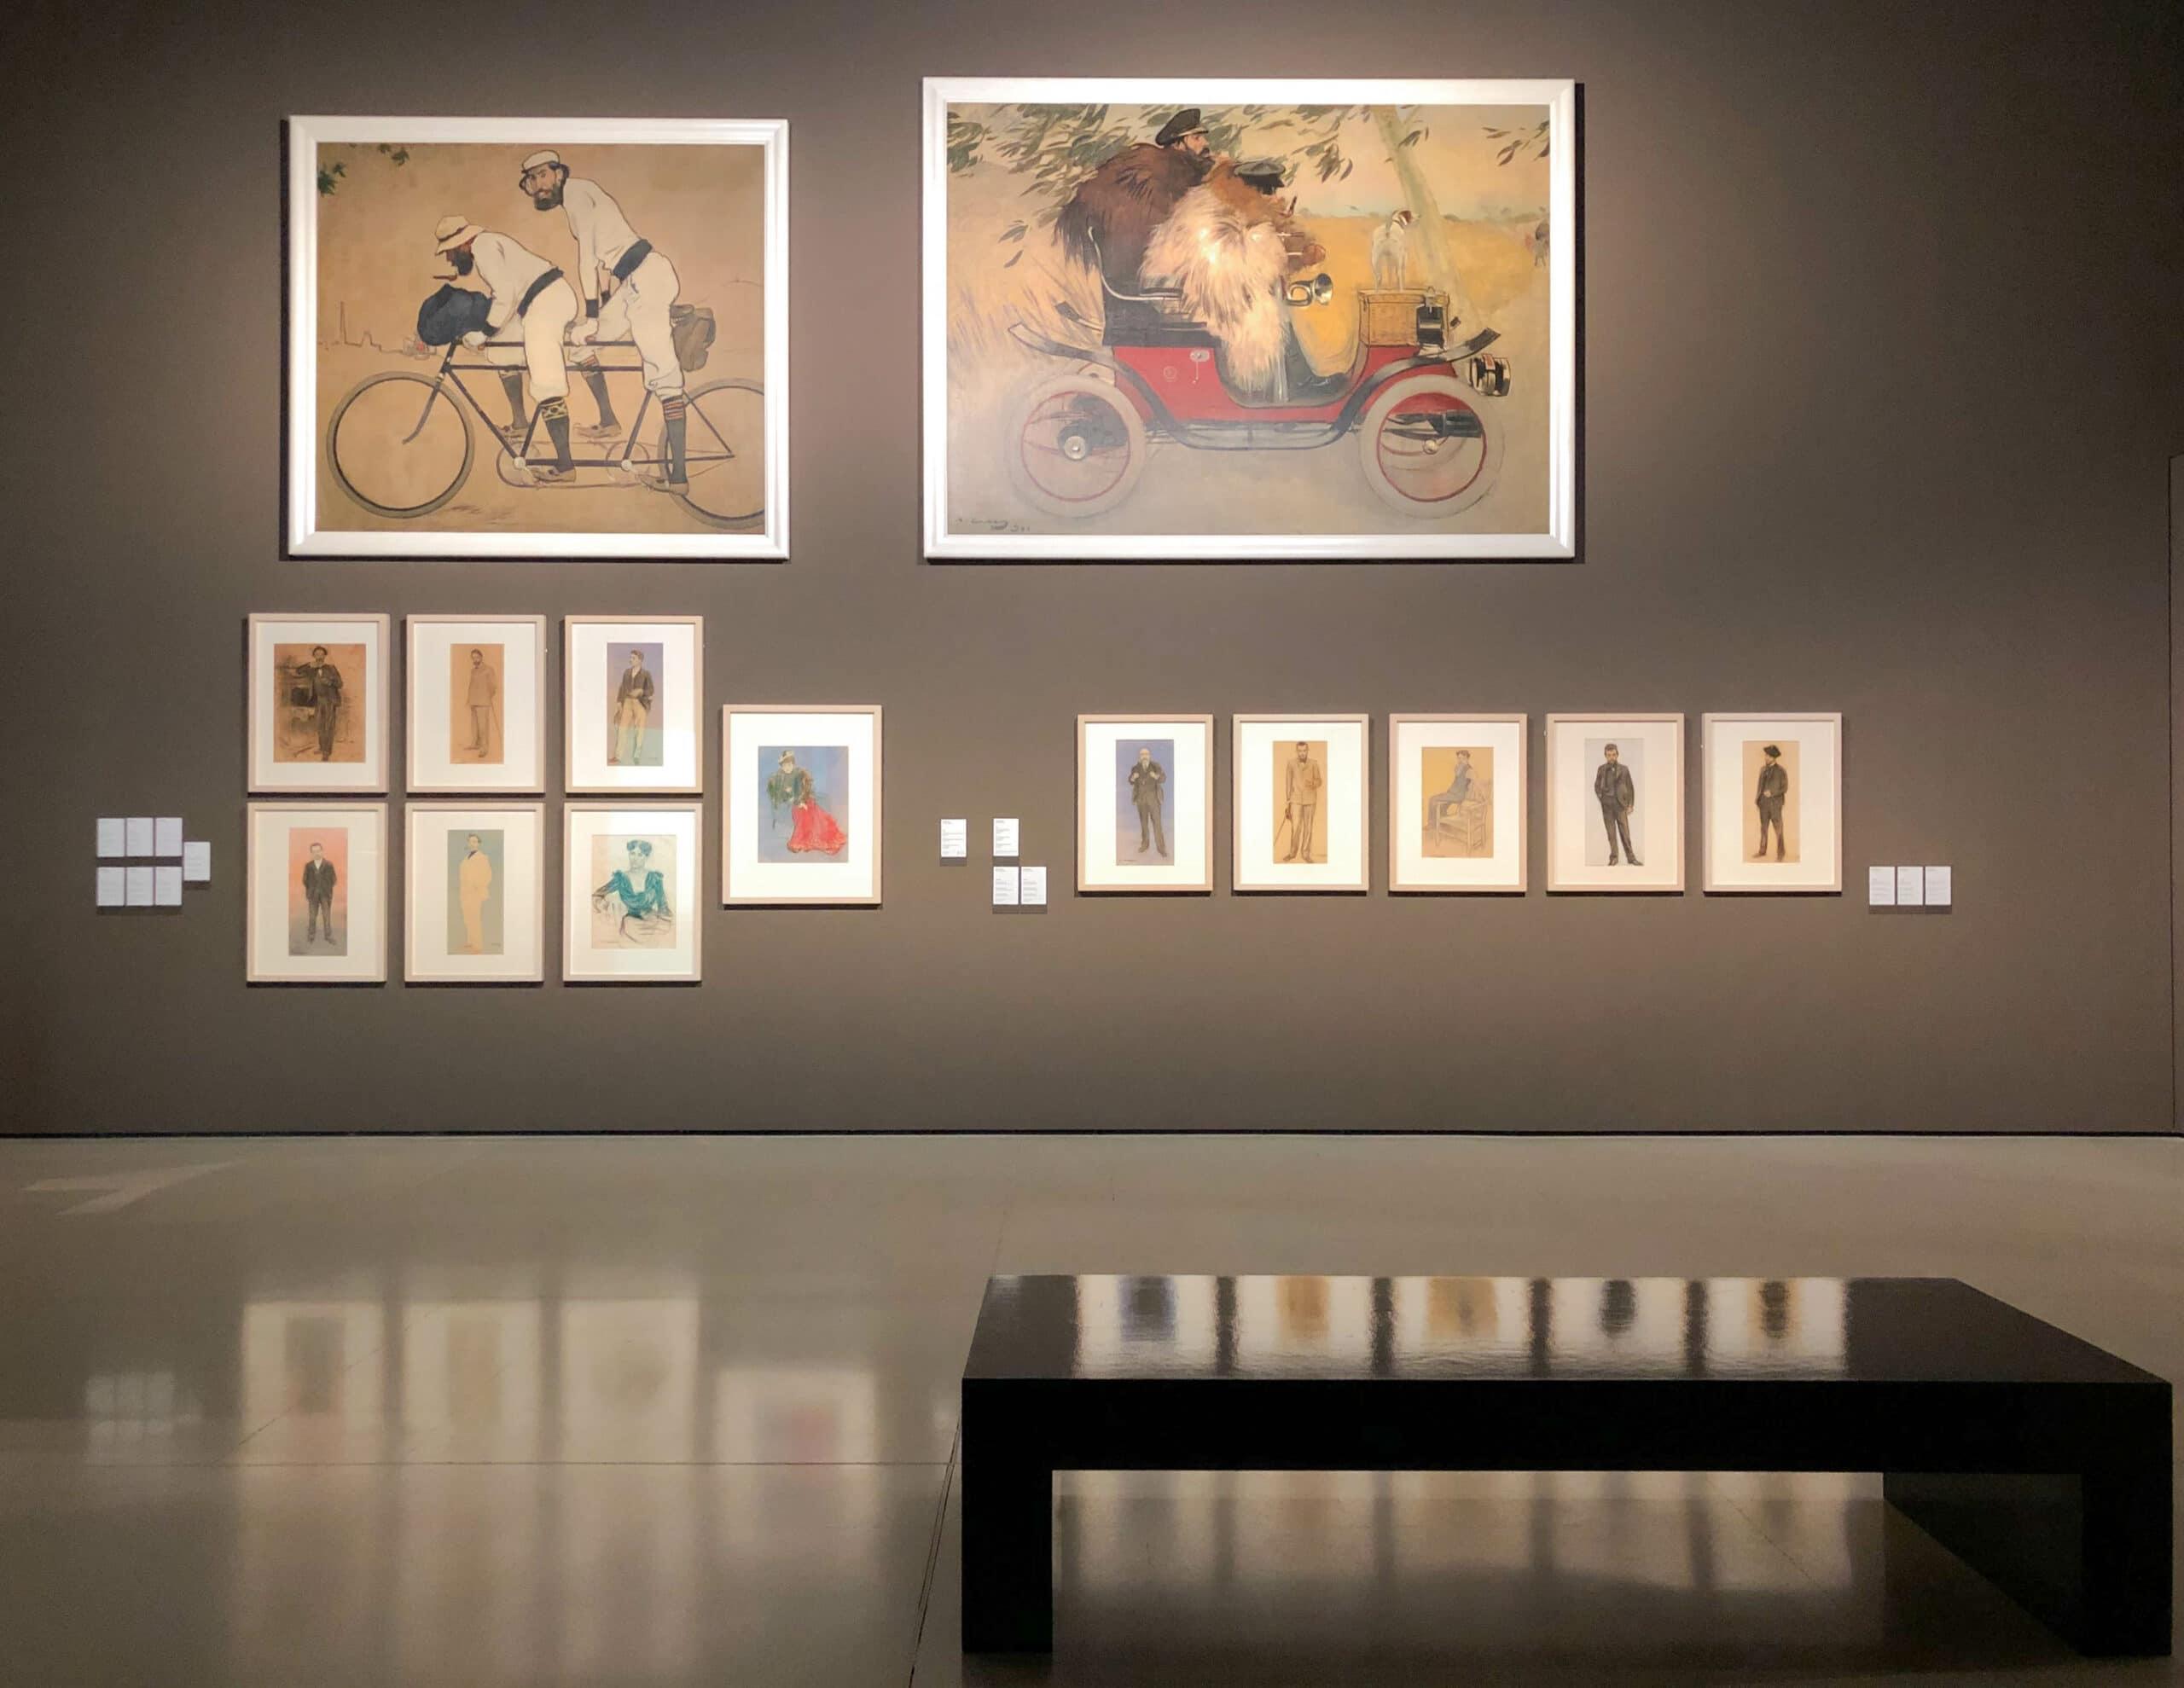 "eide großen Gemälde dieser Wandpräsentation von Ramon Casas, ""Ramon Casa und Pere Romeu in einem Auto"" 1901 und ""Ramon Casas und Pere Romeu auf einem Tandem"", 1897, Museu National d'Art de Catalunya"